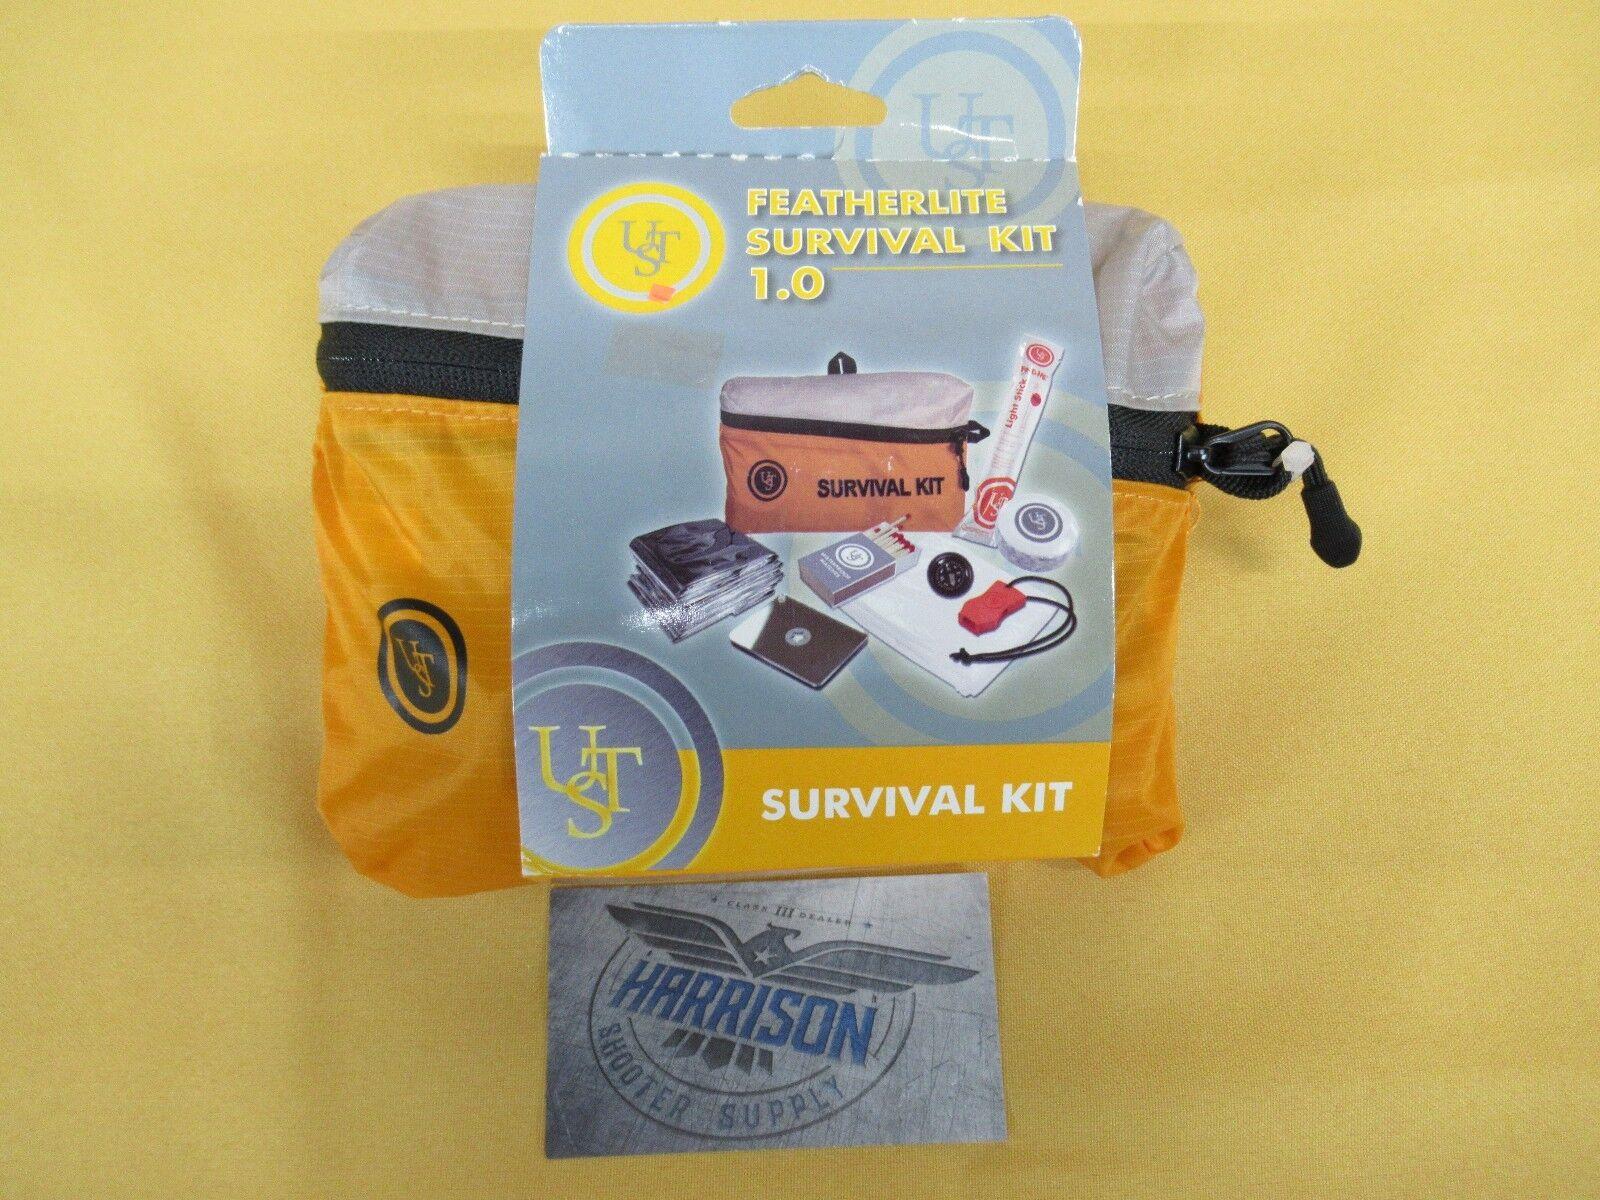 Ultimate Survival Technologies FeatherLite Survival Kit 1.0,